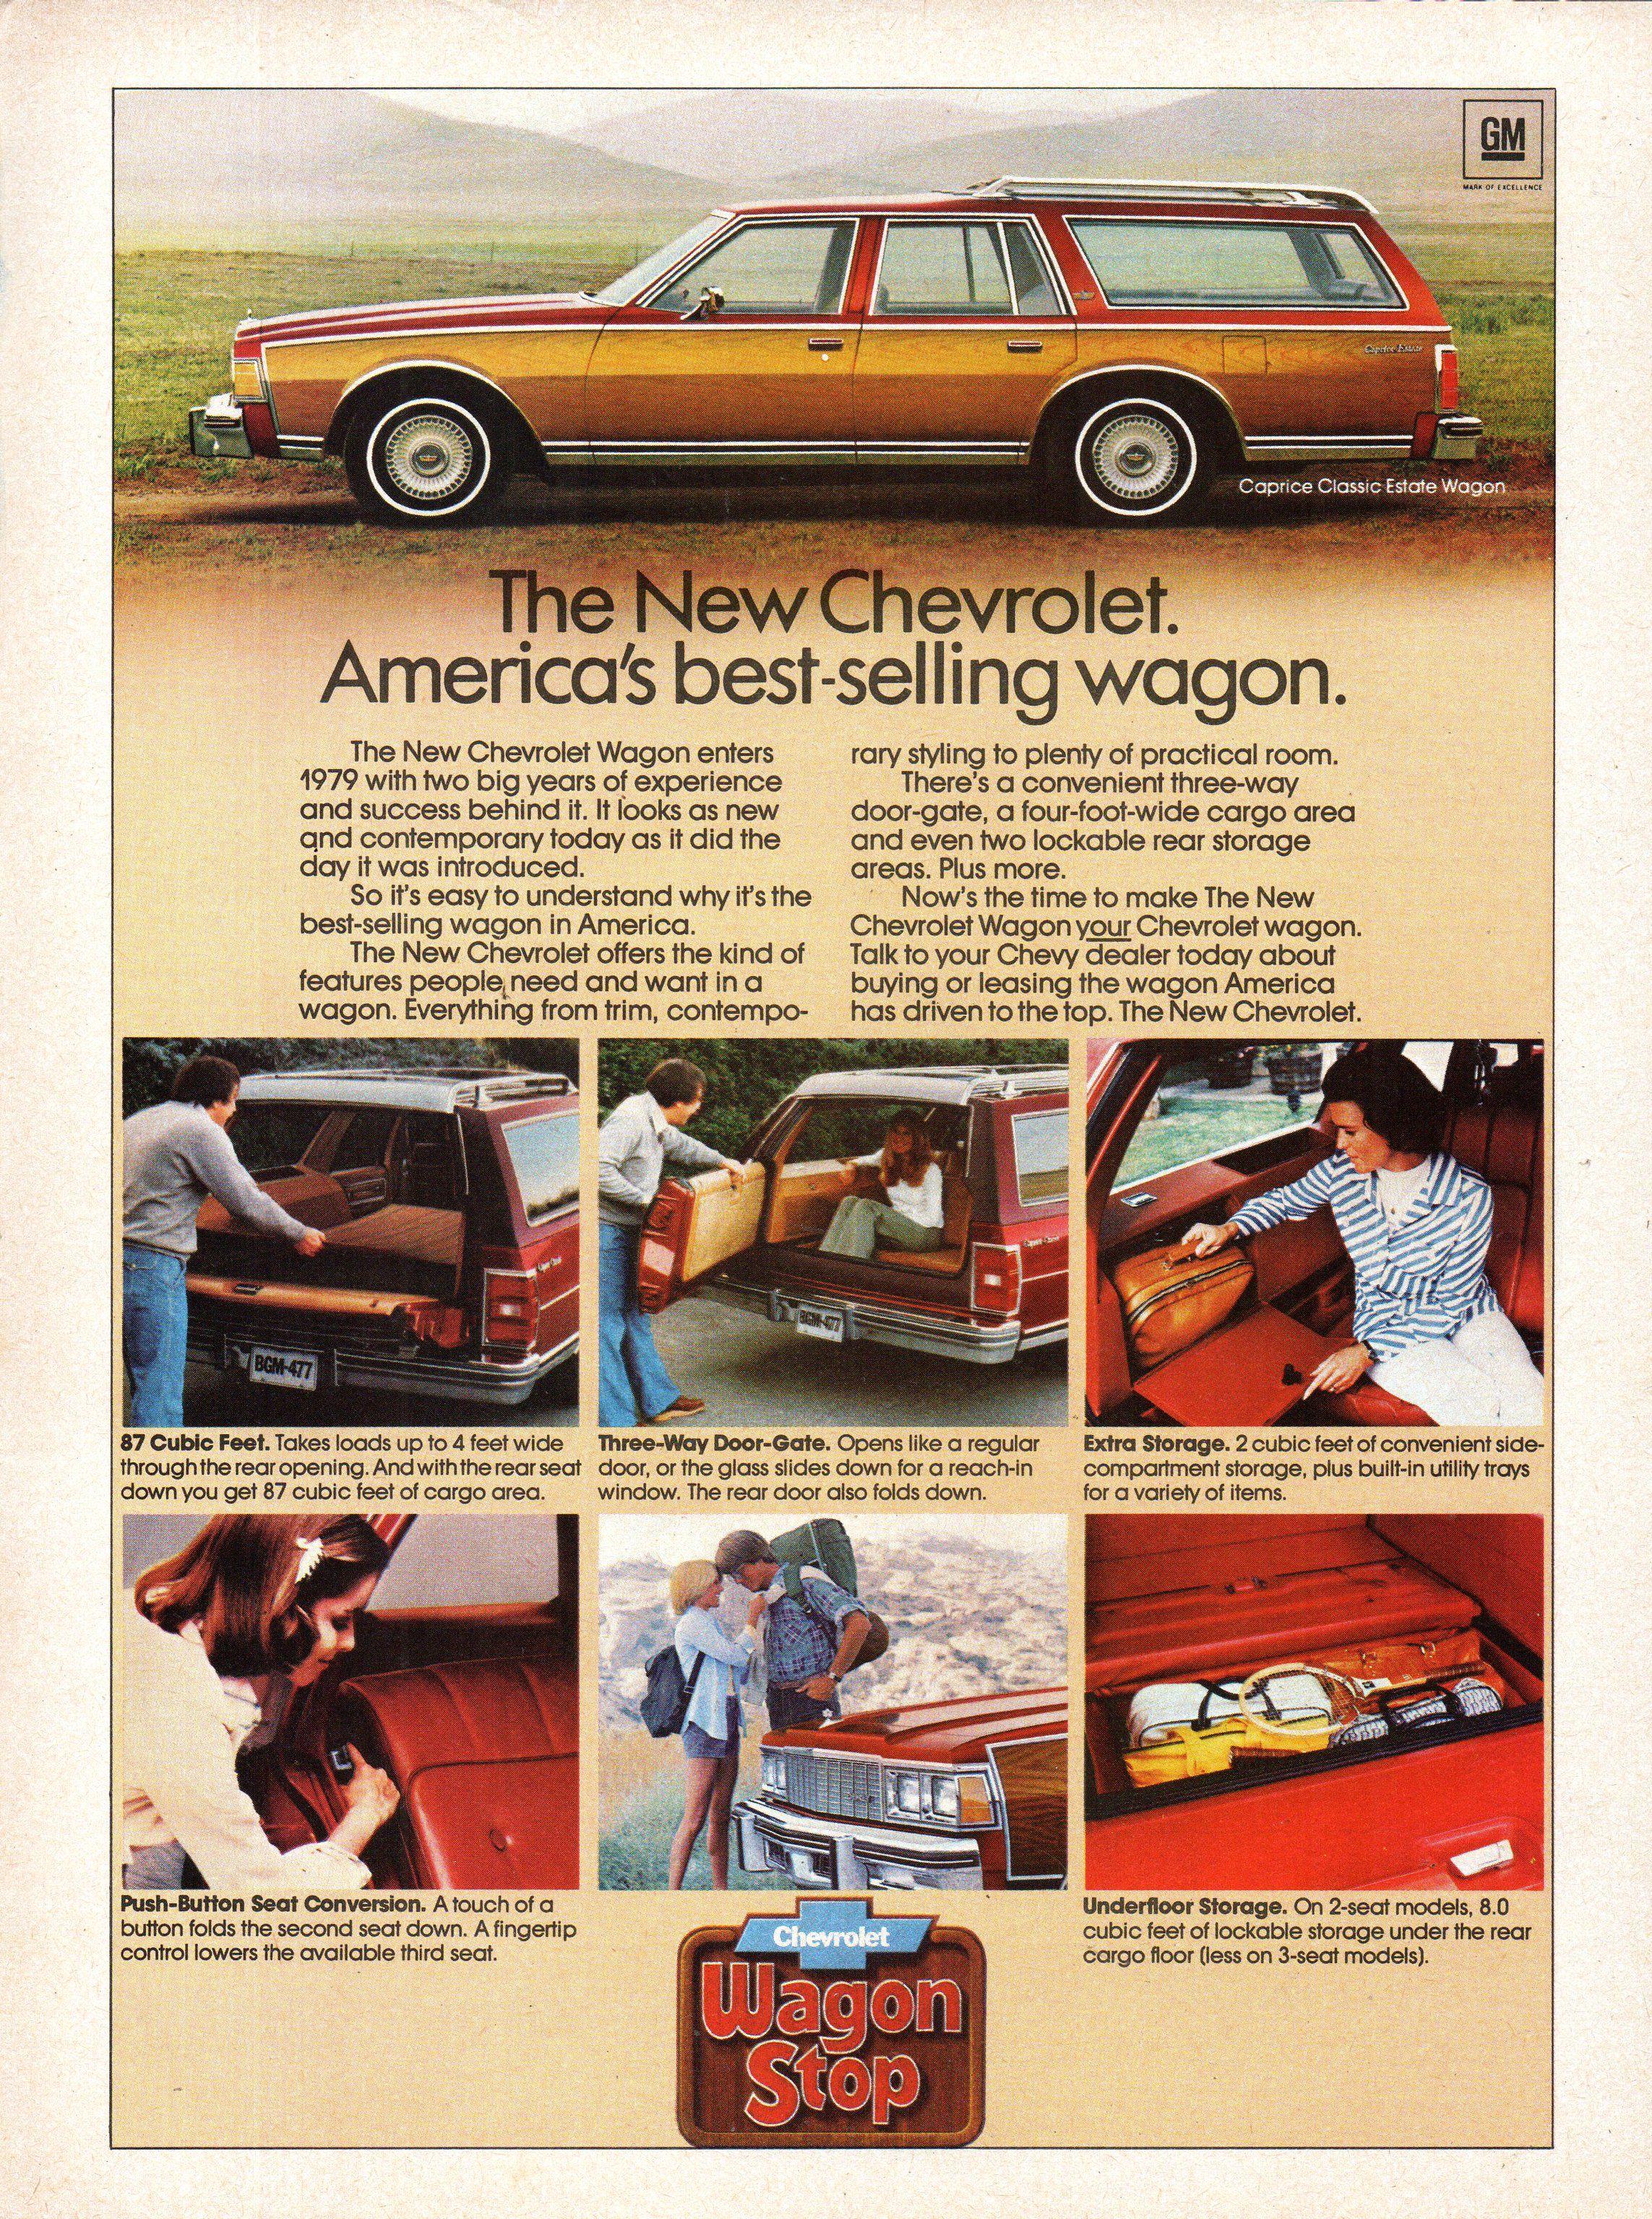 1979 Chevrolet Caprice Classic Estate Wagon USA Original Magazine Advertisement